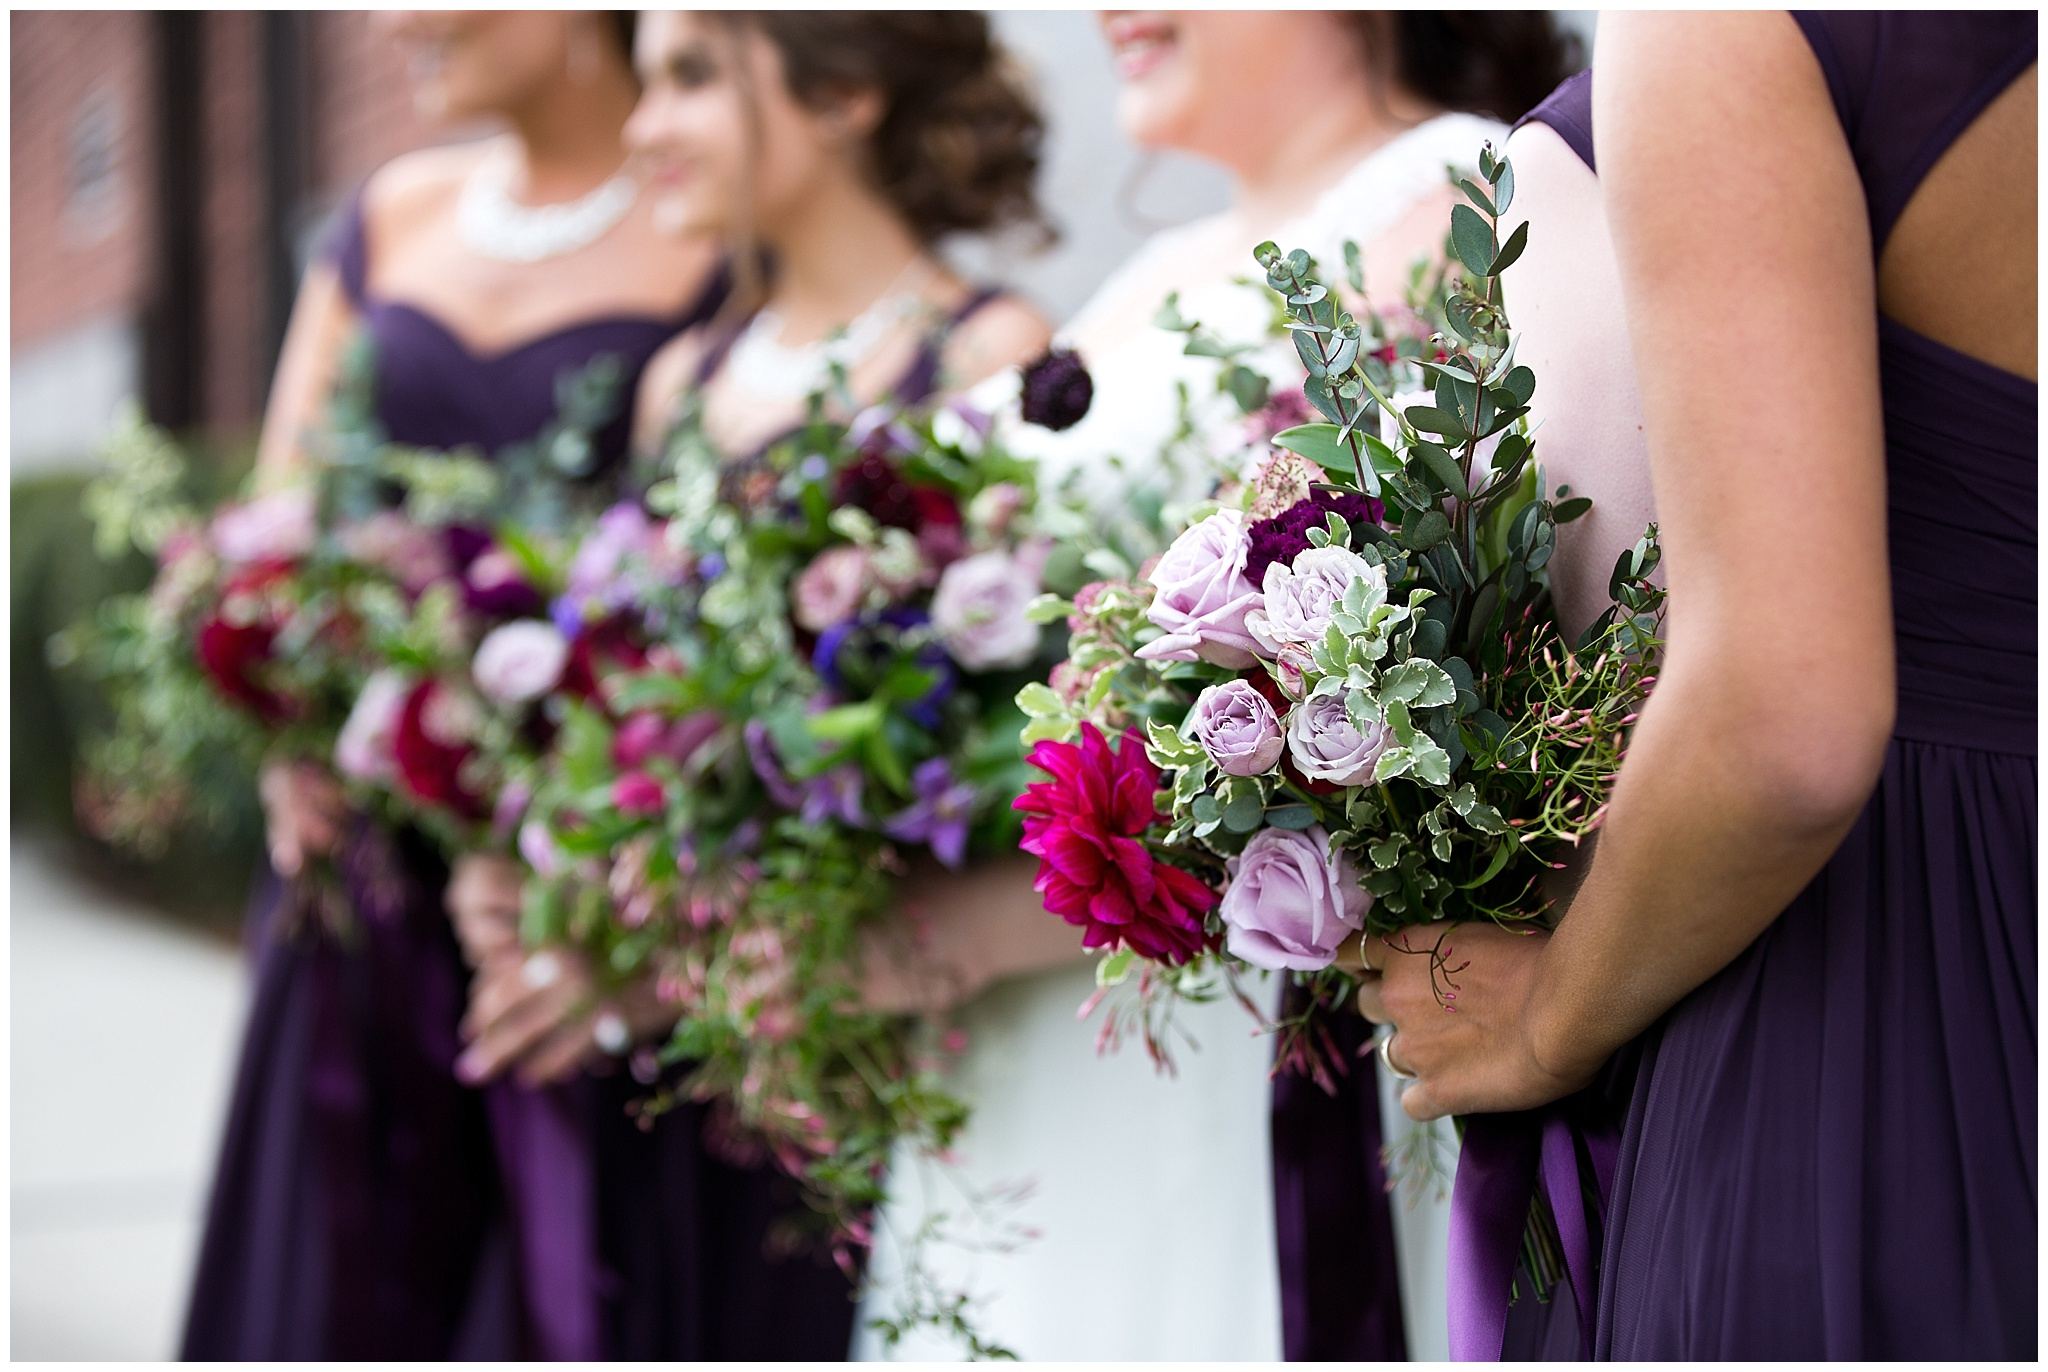 Carol_and_Grant_Wedding_3-3-18-7935.jpg